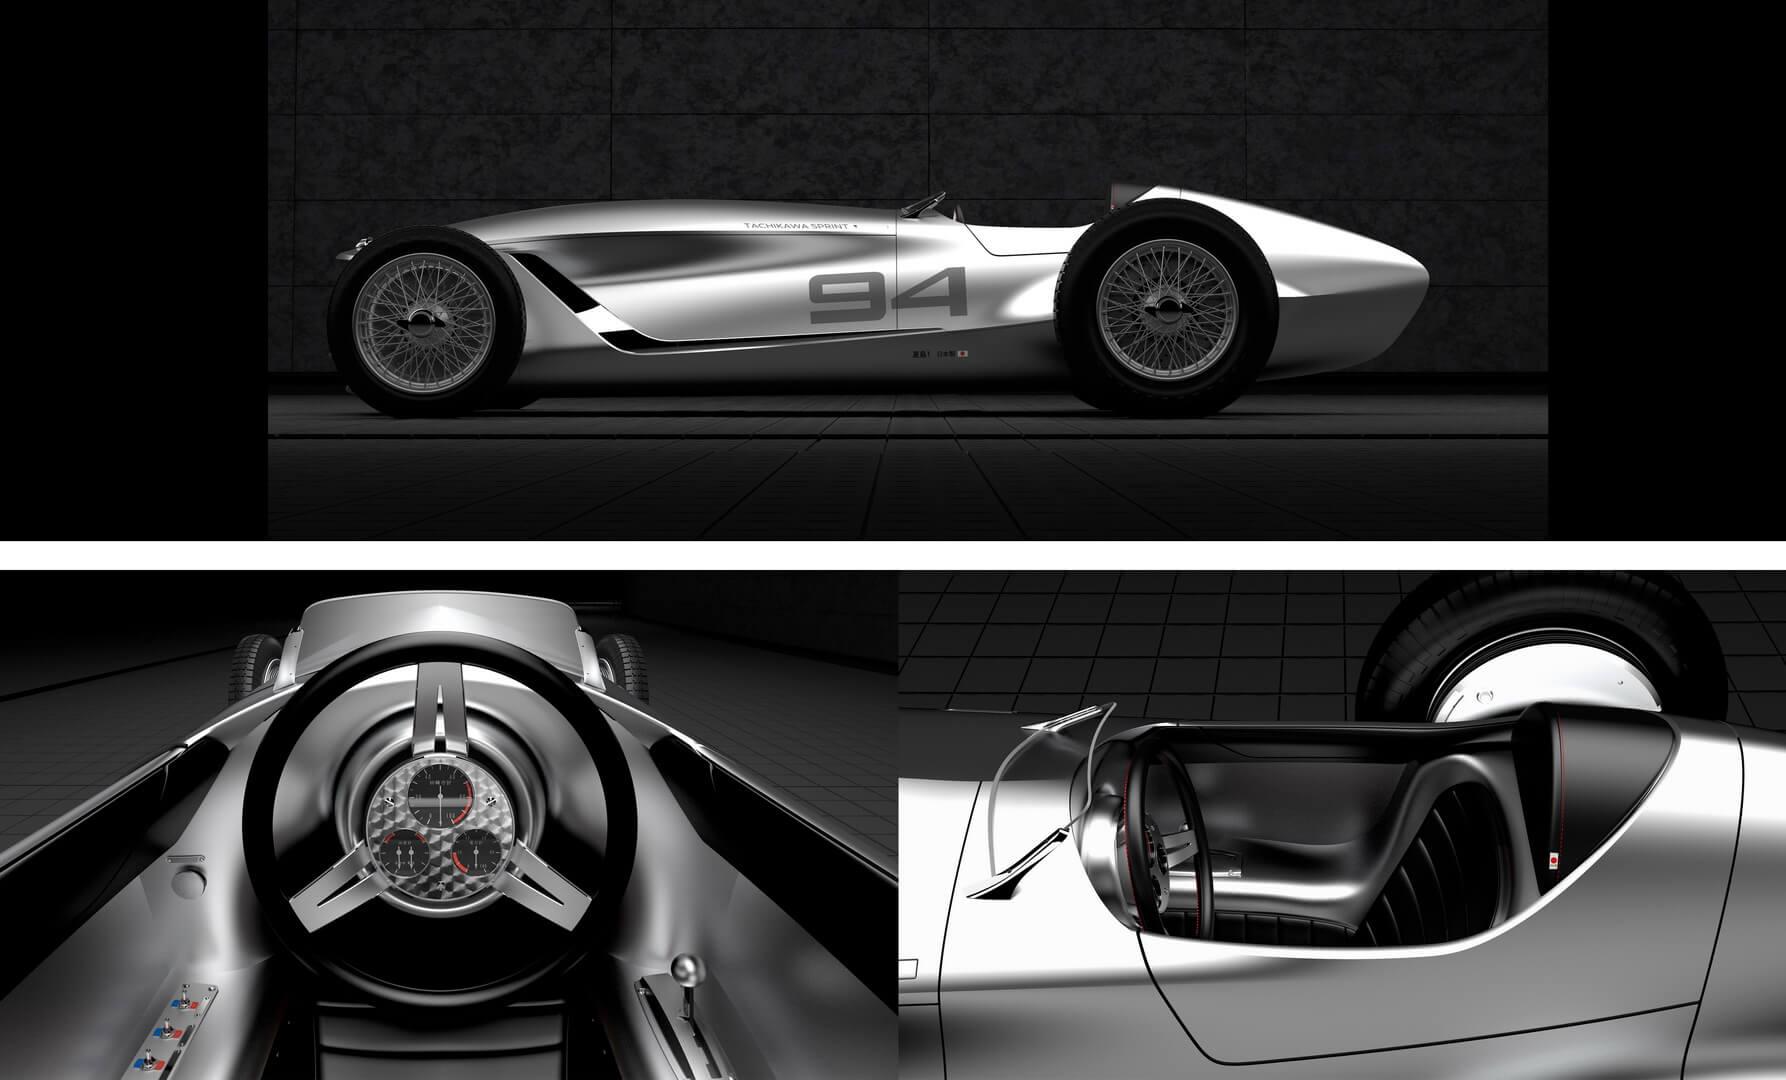 Дизайн электрического спорткара Infiniti Prototype 9